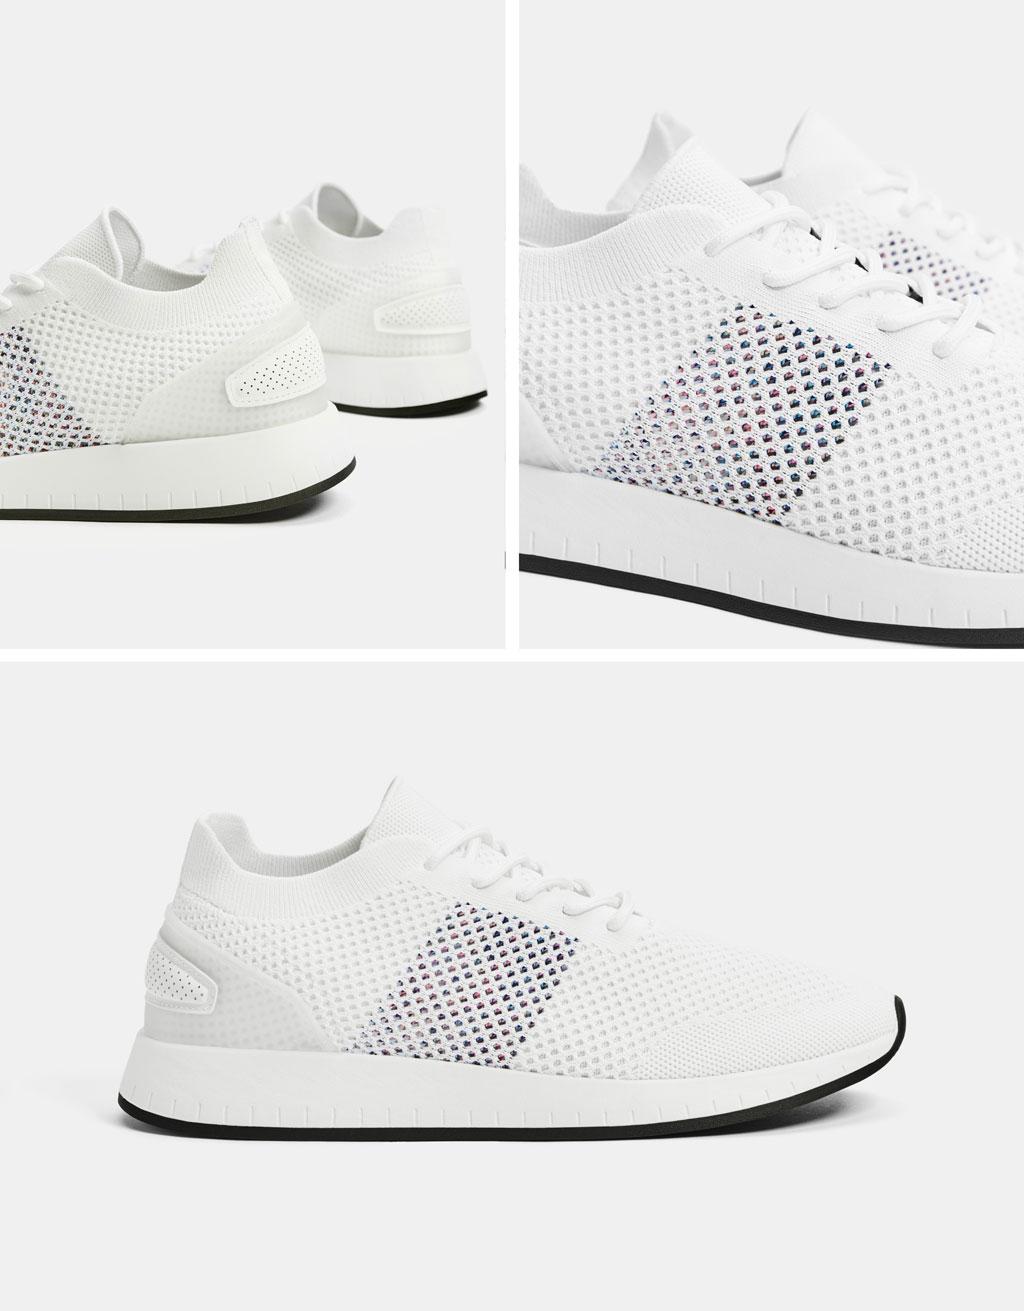 Men's mesh sneakers